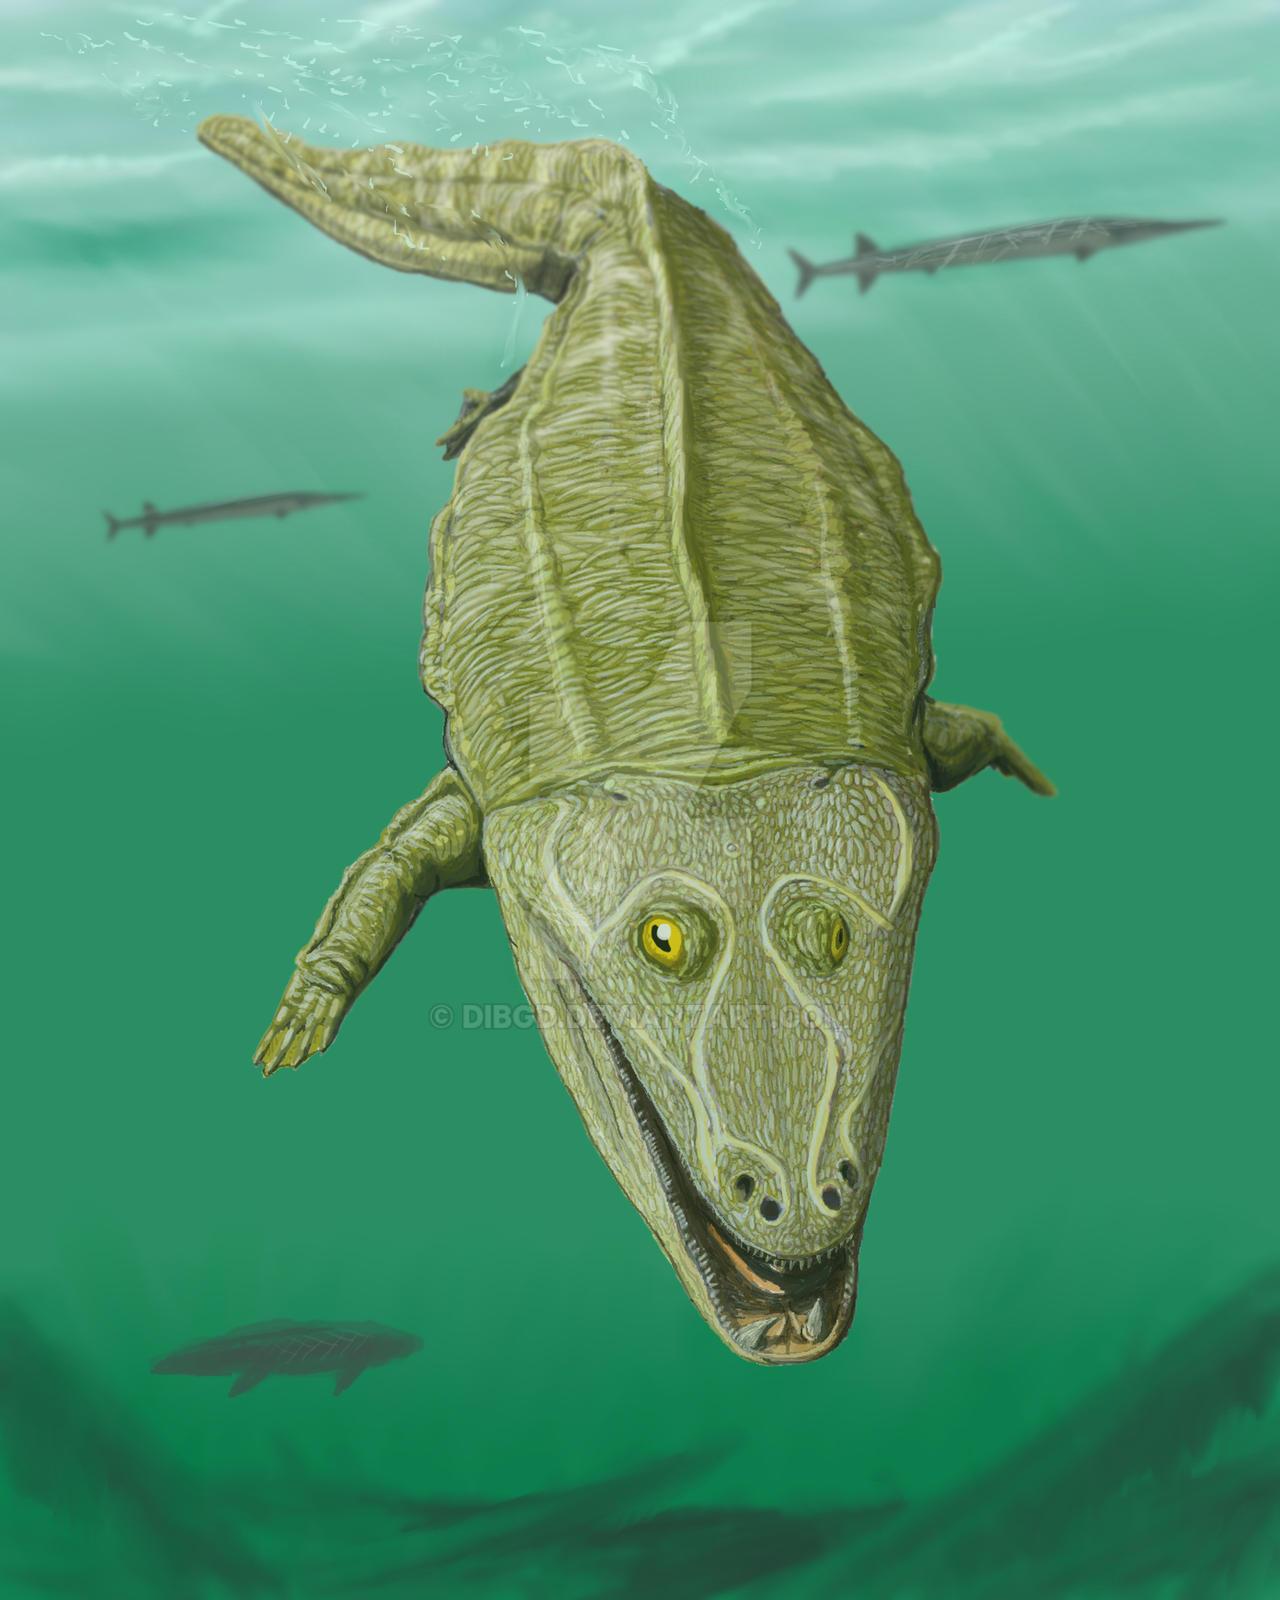 Mastodonsaurus giganteus by DiBgd